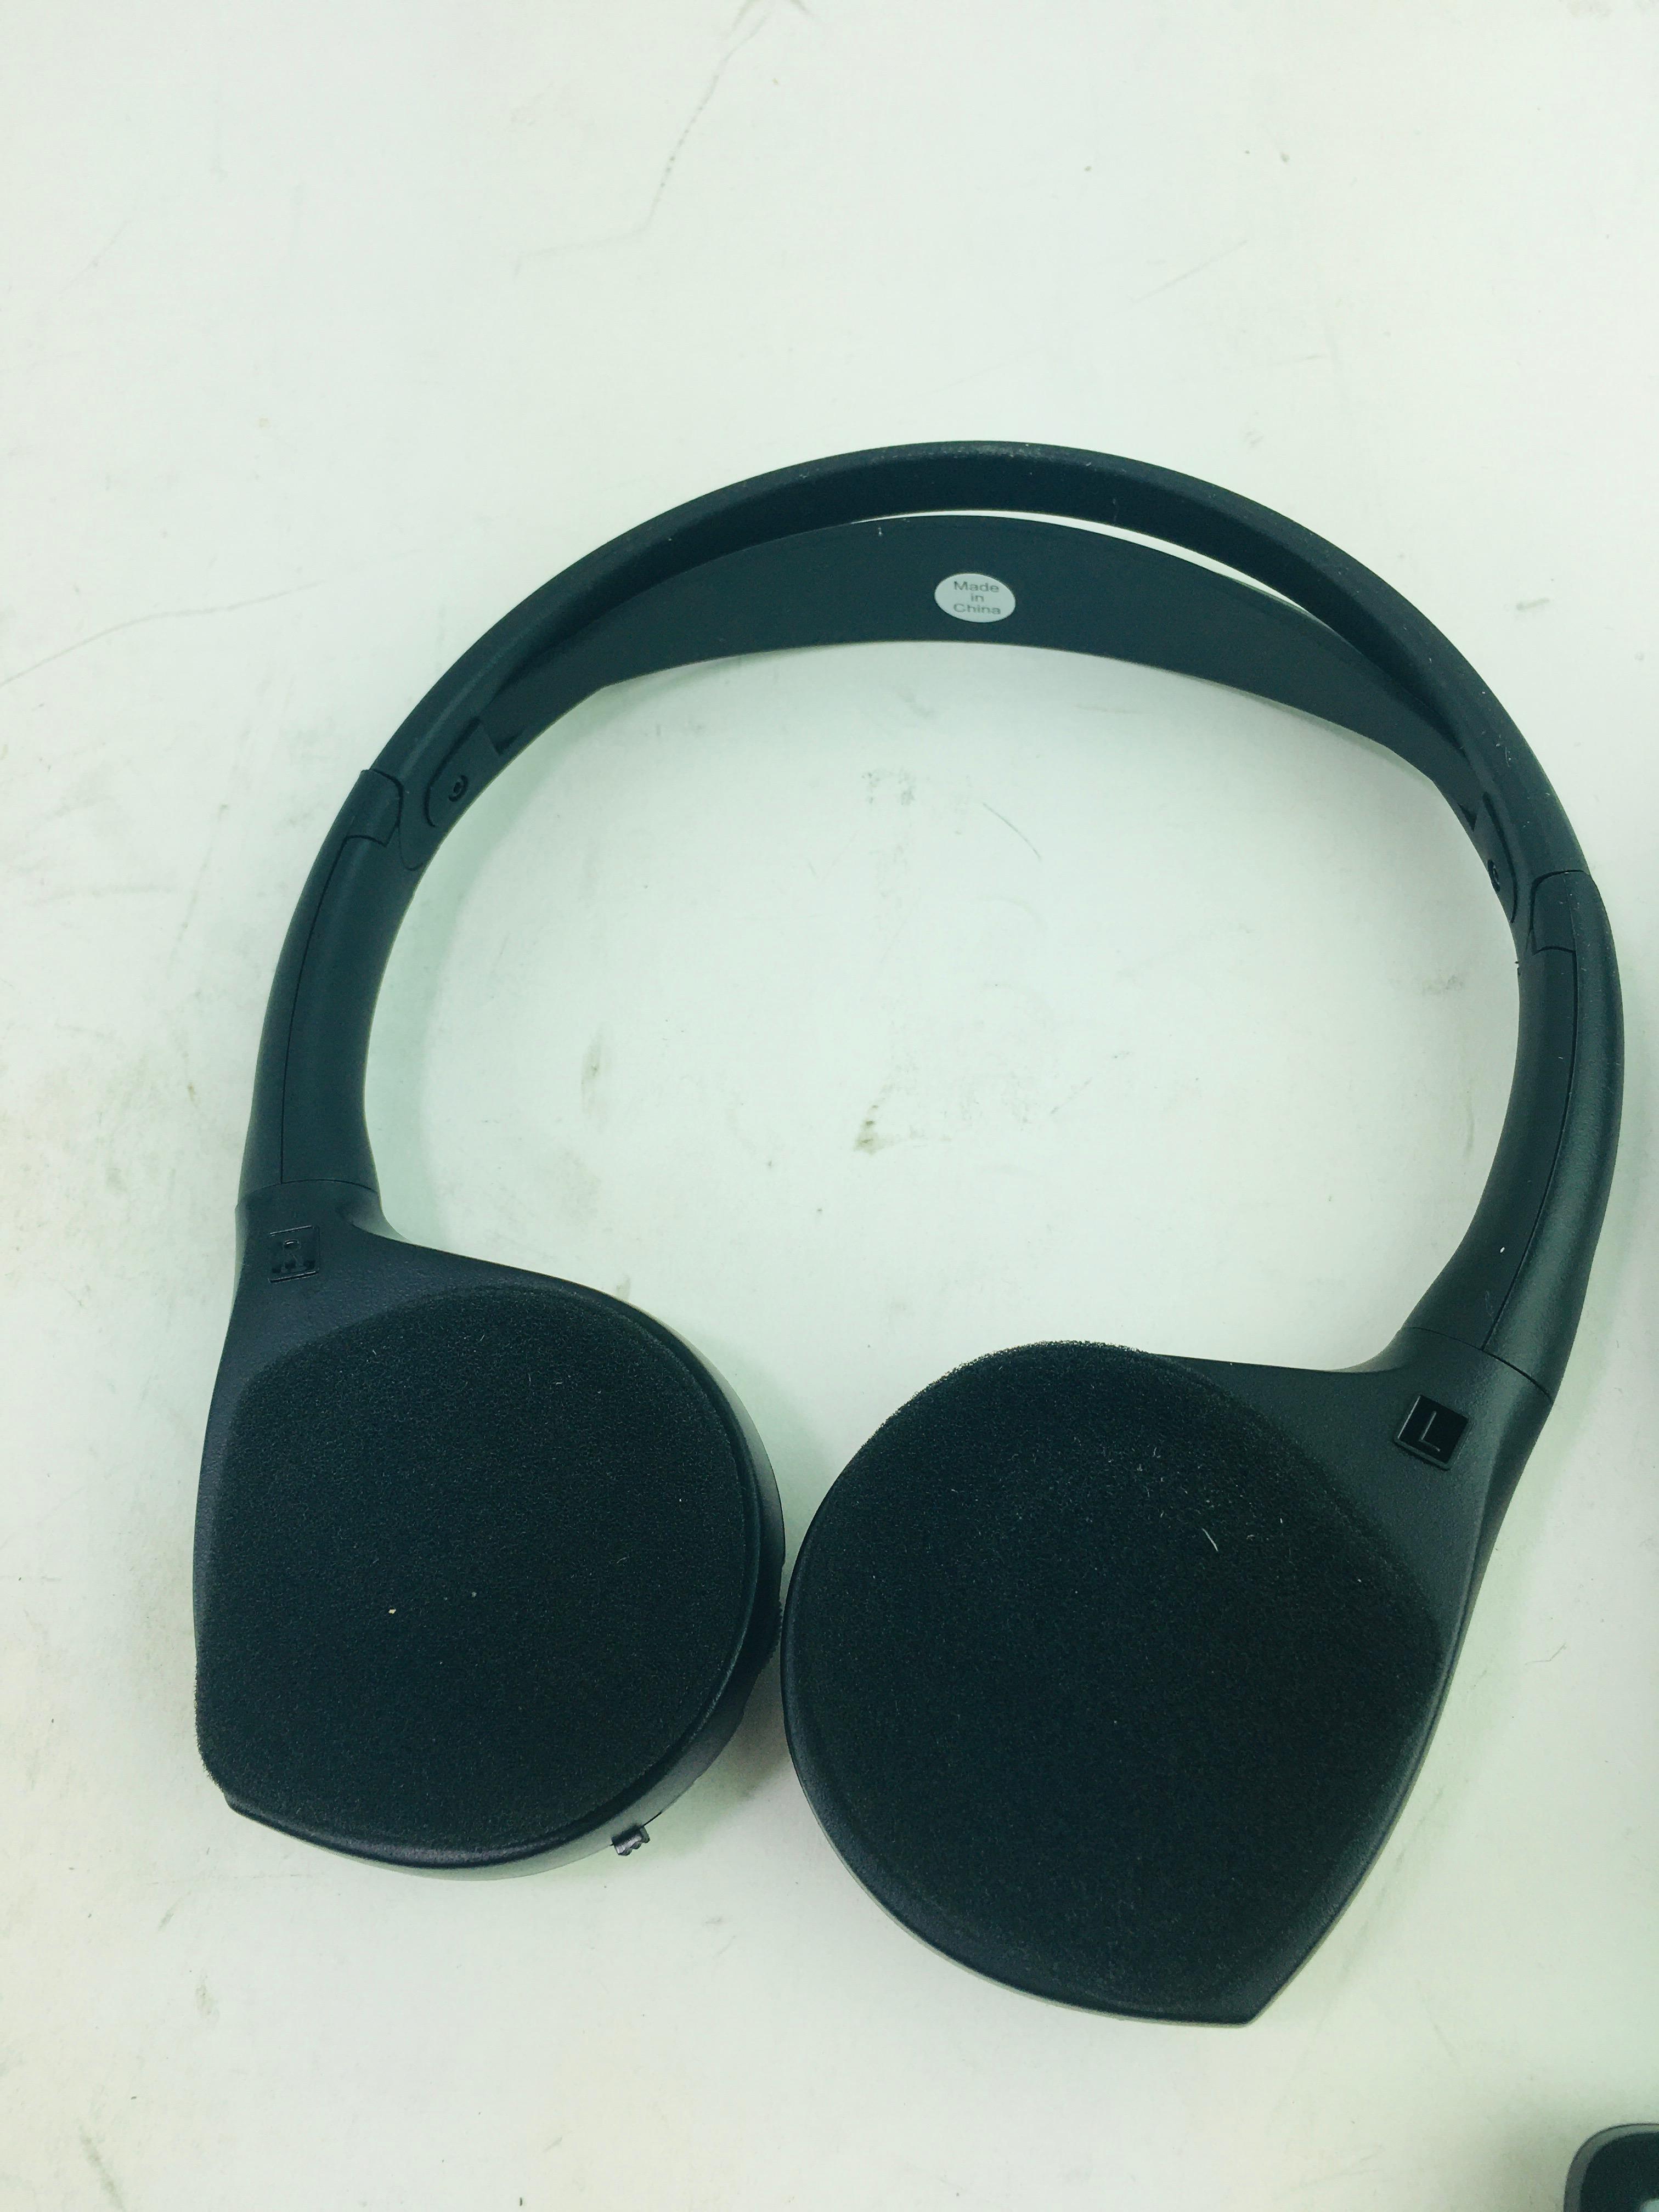 New Genuine OEM Mopar 82211695AD Chrysler Rear Audio U-Connect Headphones Remote - image 3